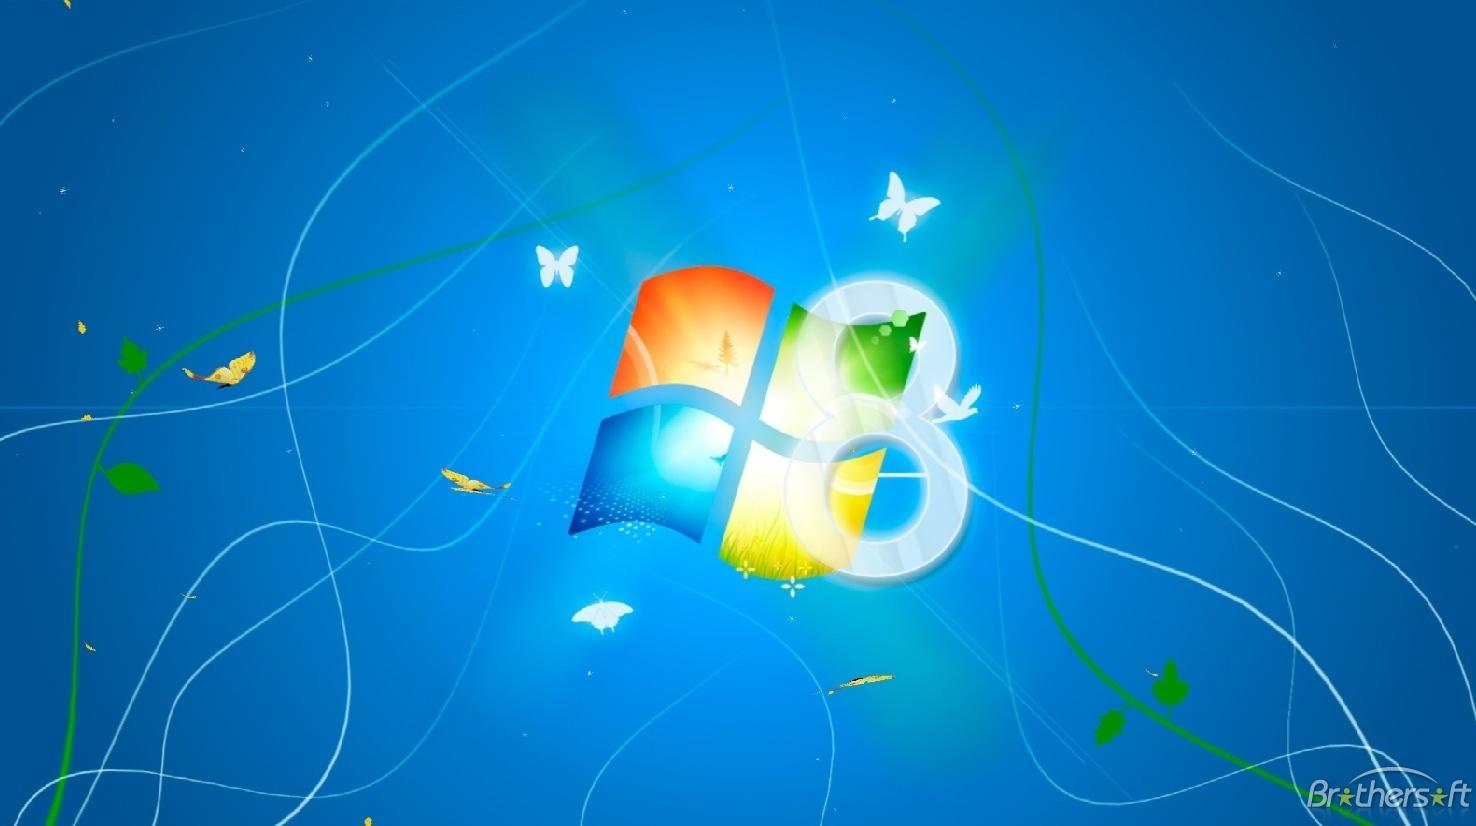 Windows 8 Light Animated Wallpaper Windows 8 Light Animated Wallpaper 1476x826